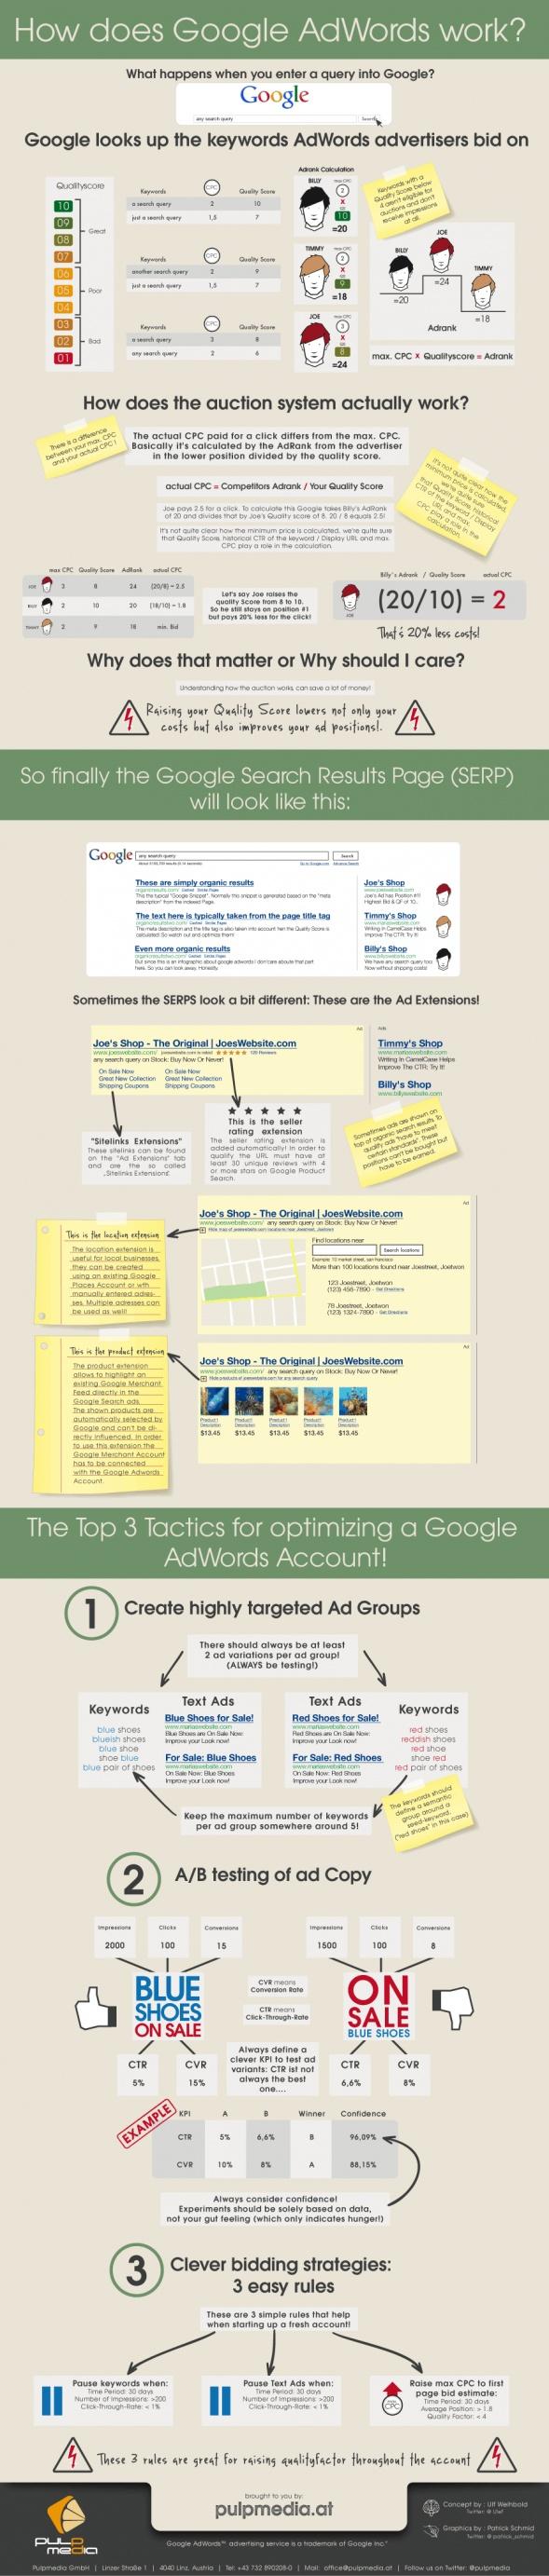 Google AdWords Explained